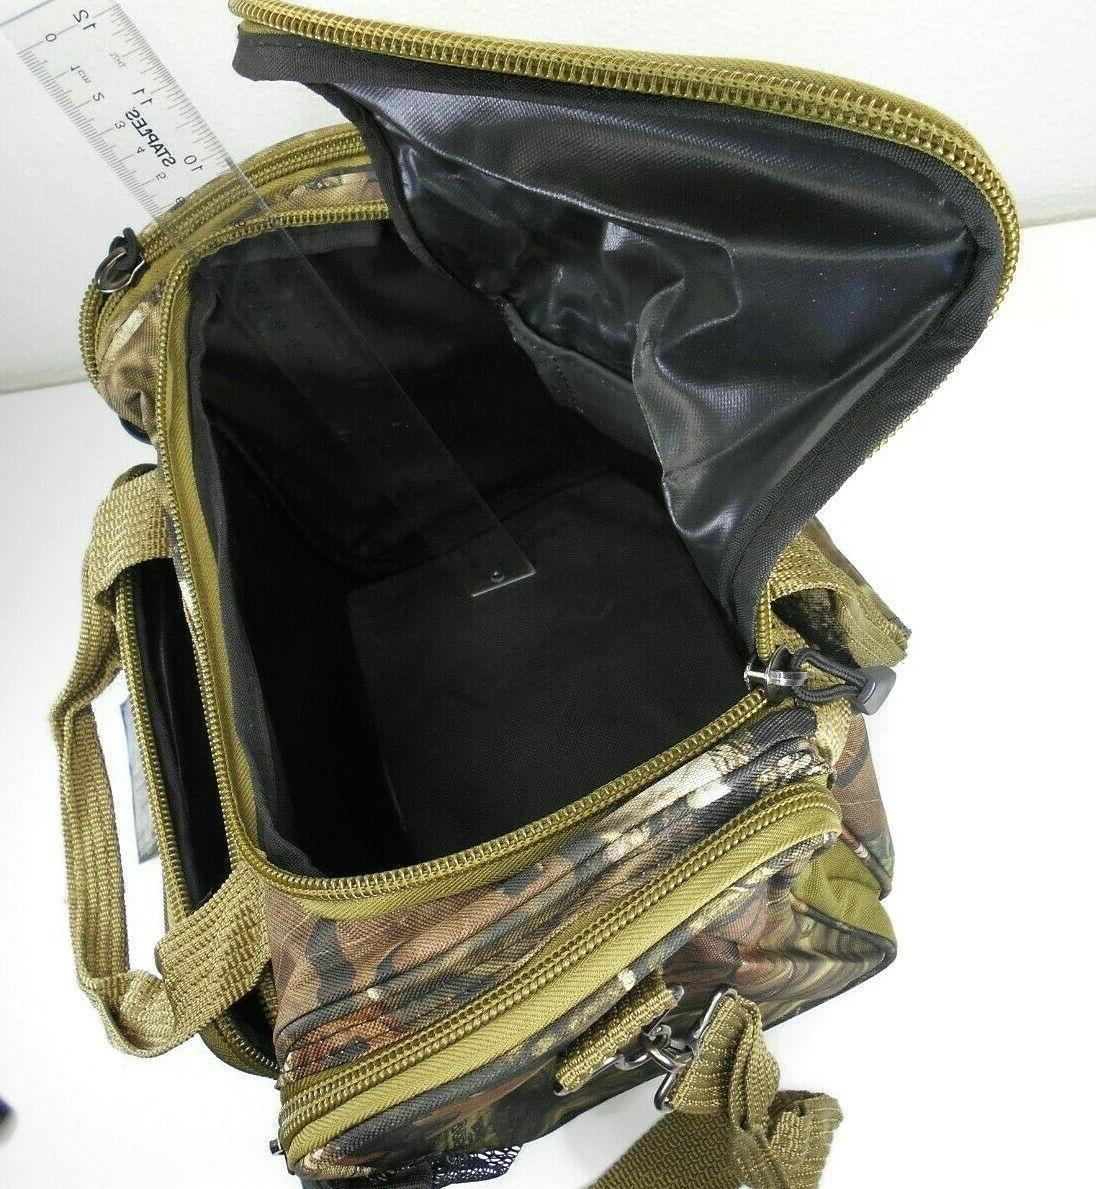 Explorer Mossy gear bag travel